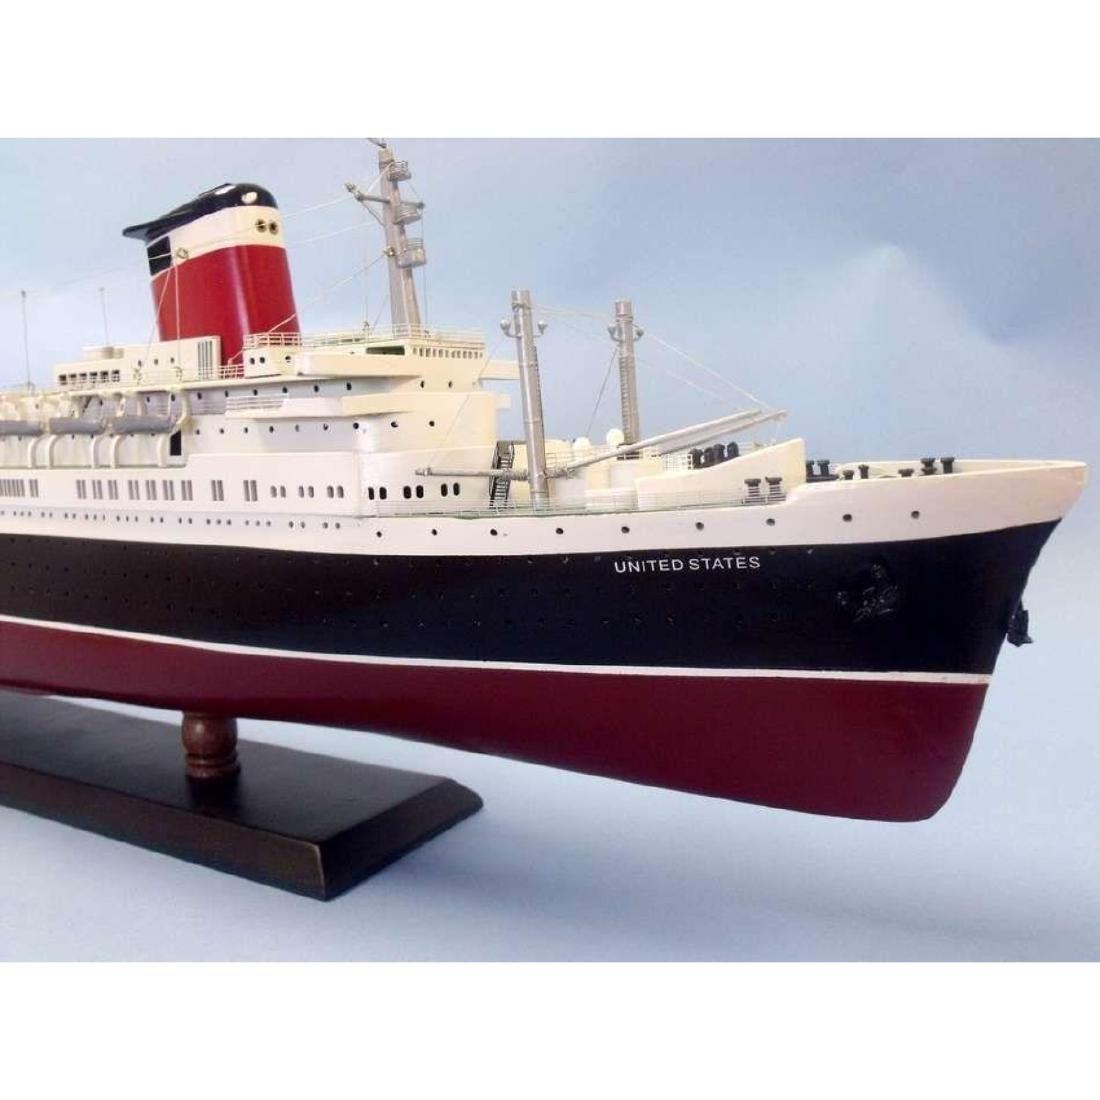 "SS United States Limited Model Cruise Ship 40"" w/ LED - 8"